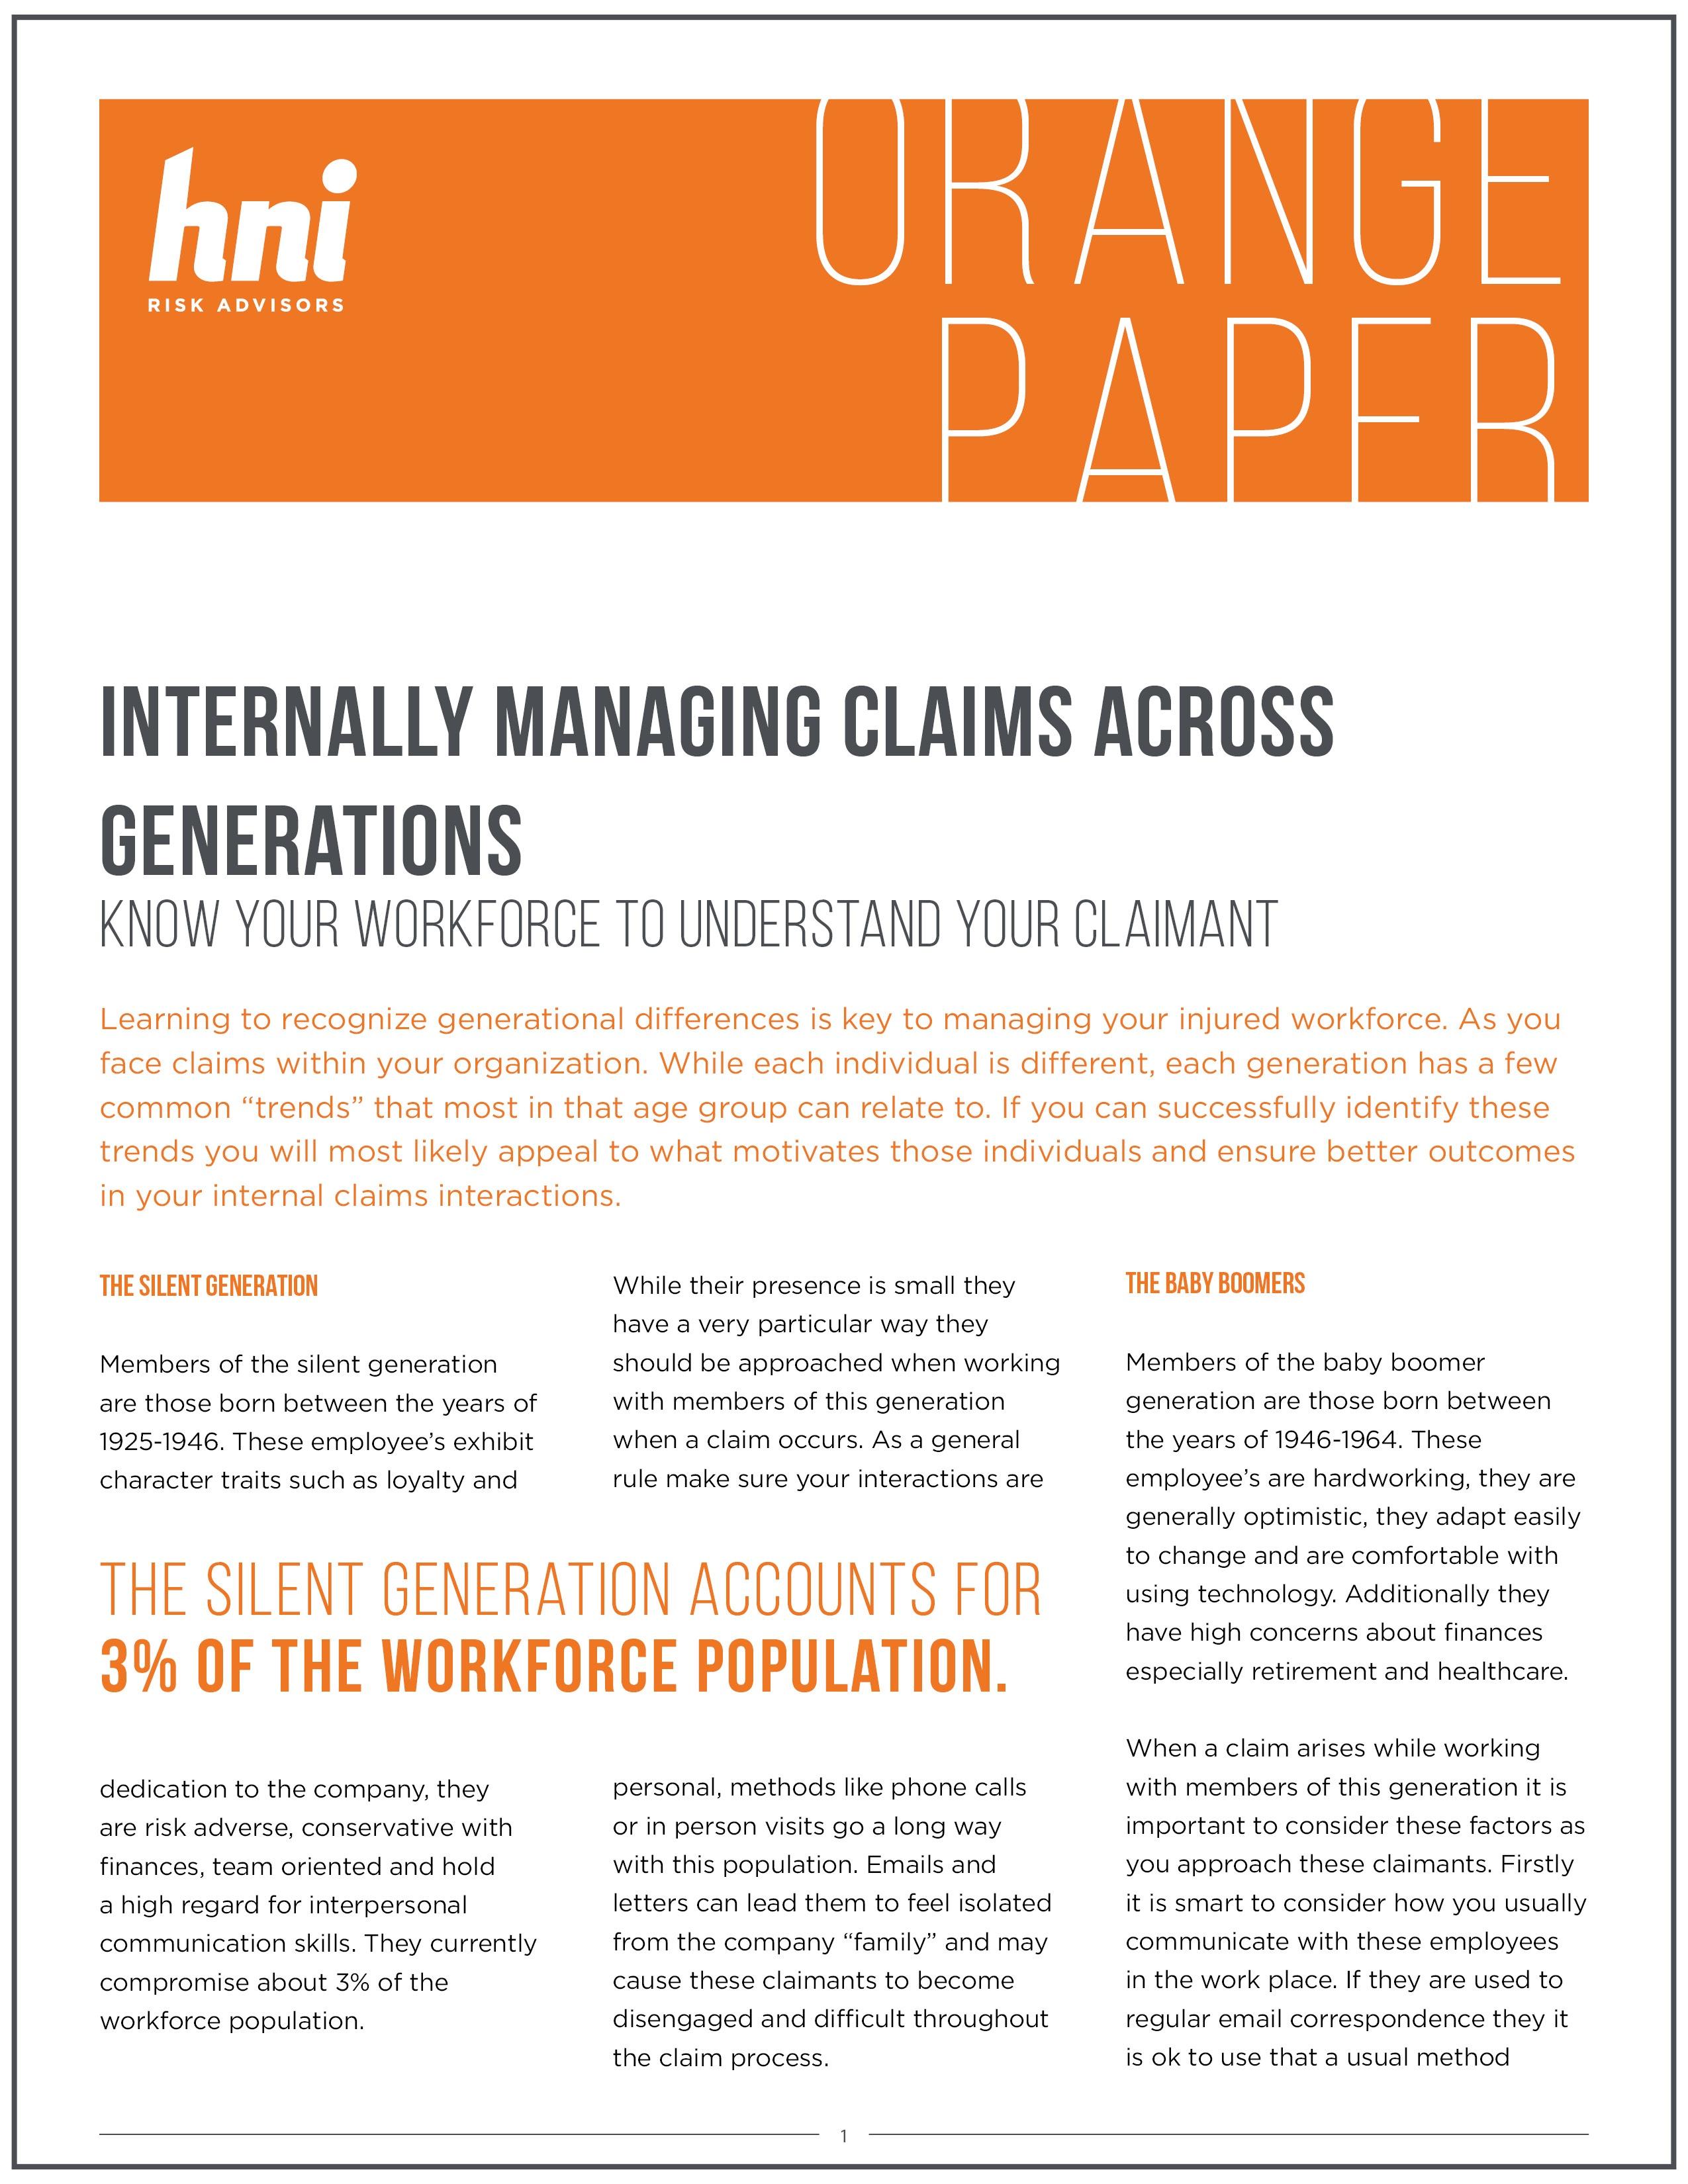 HNI_Orange Paper_Internally Managing Claims Across Generations-1.jpg